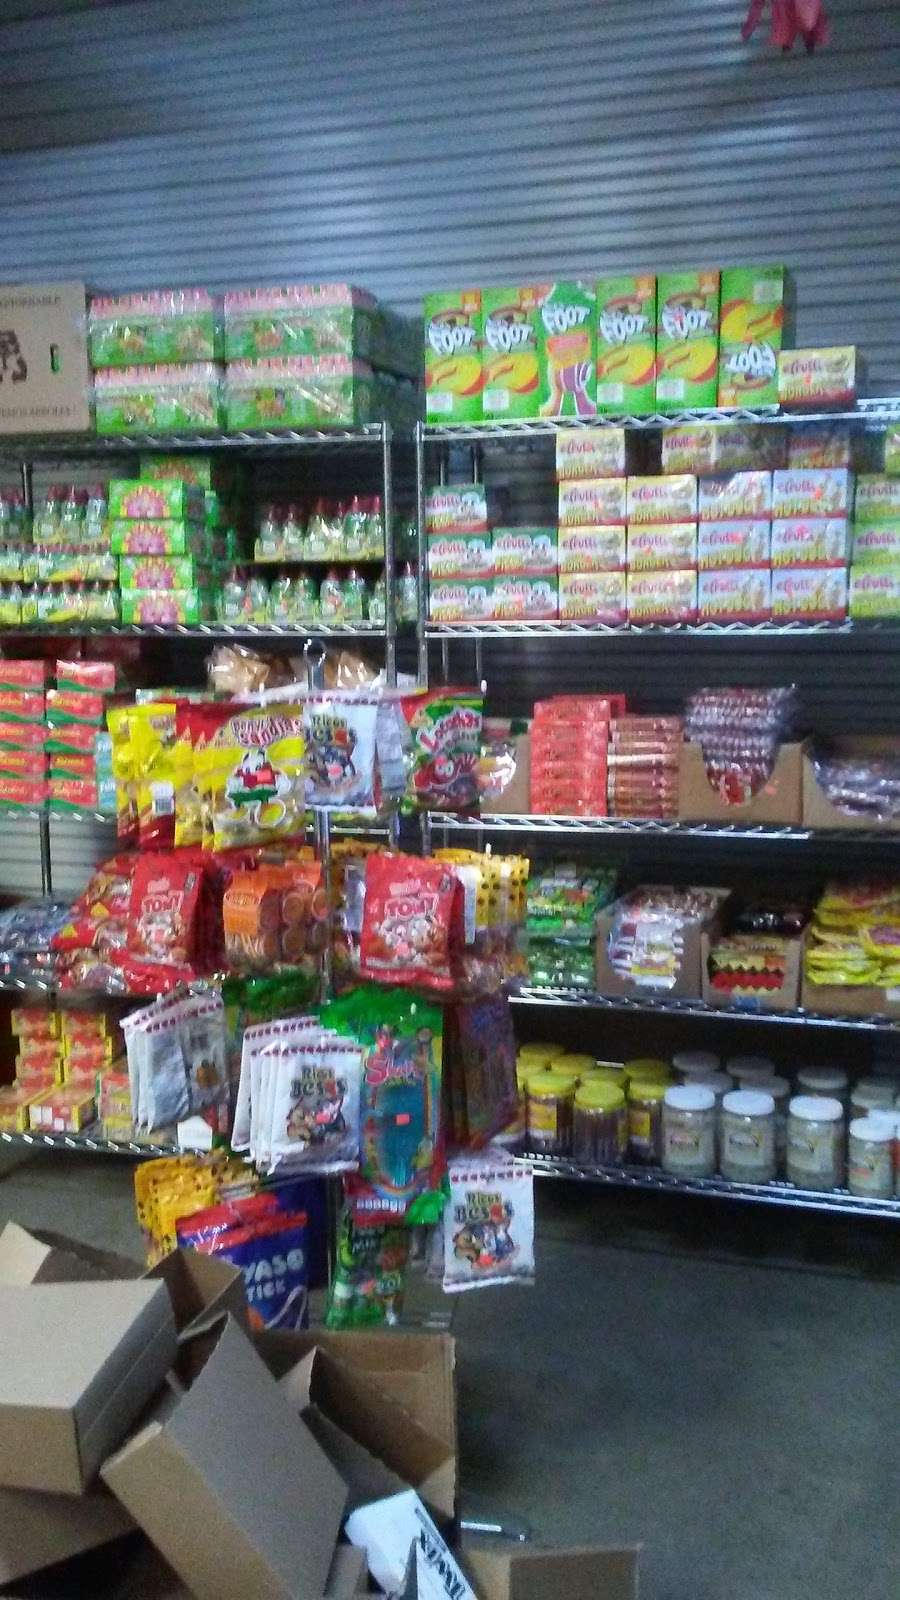 Paleteria Hidalgo - store    Photo 1 of 10   Address: 16565 Orange Way # I, Fontana, CA 92335, USA   Phone: (909) 350-4130